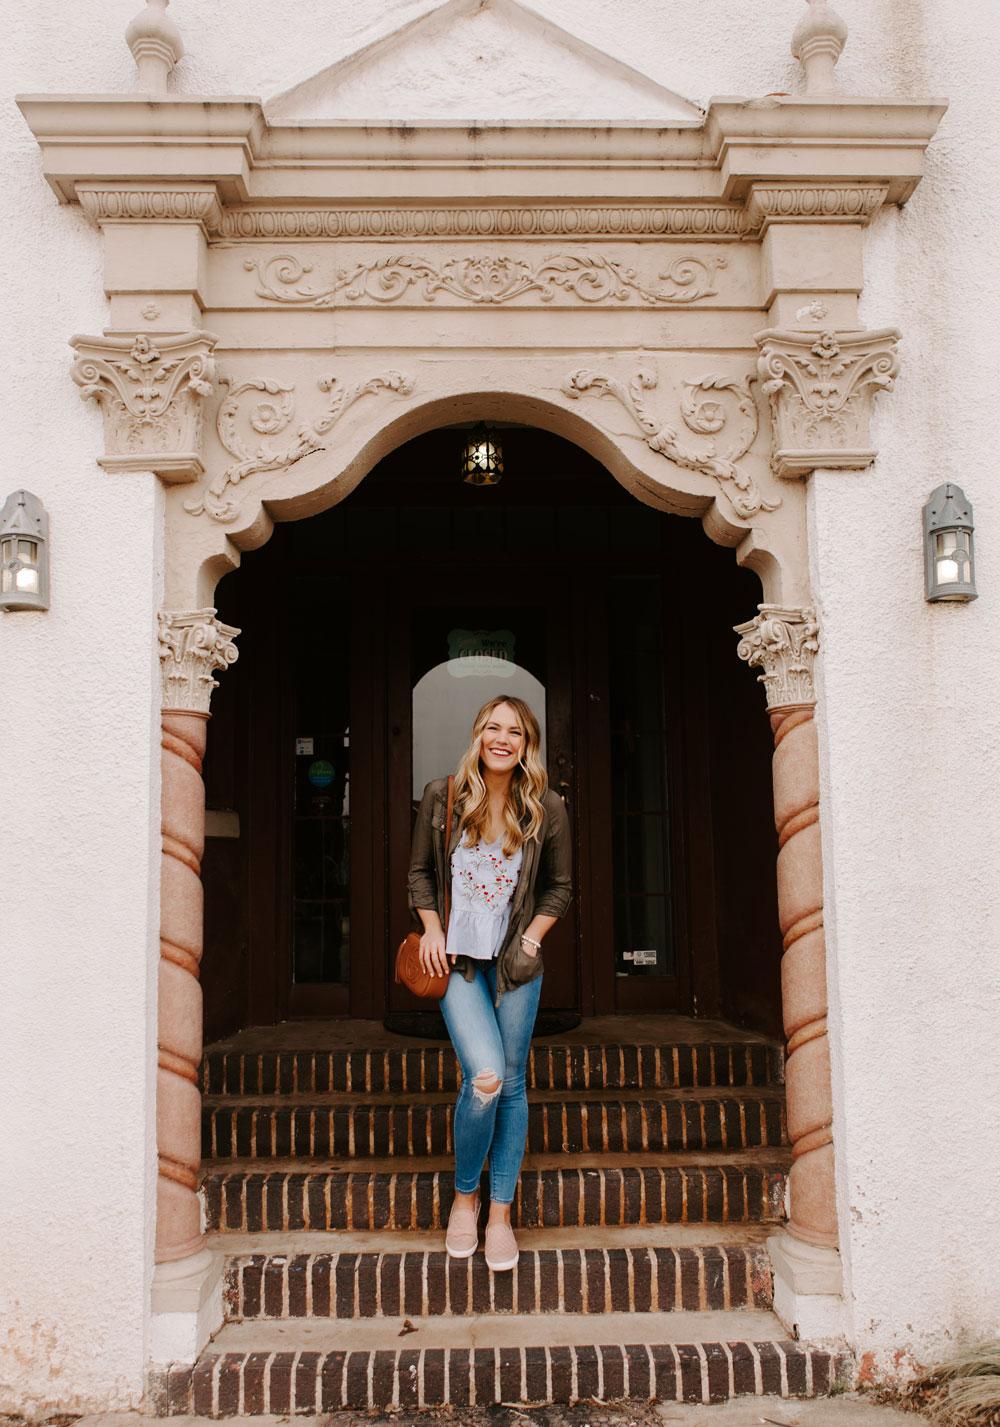 Amanda Martin of Amanda's OK blog shares her favorite spots in the Paseo Arts District of Oklahoma City